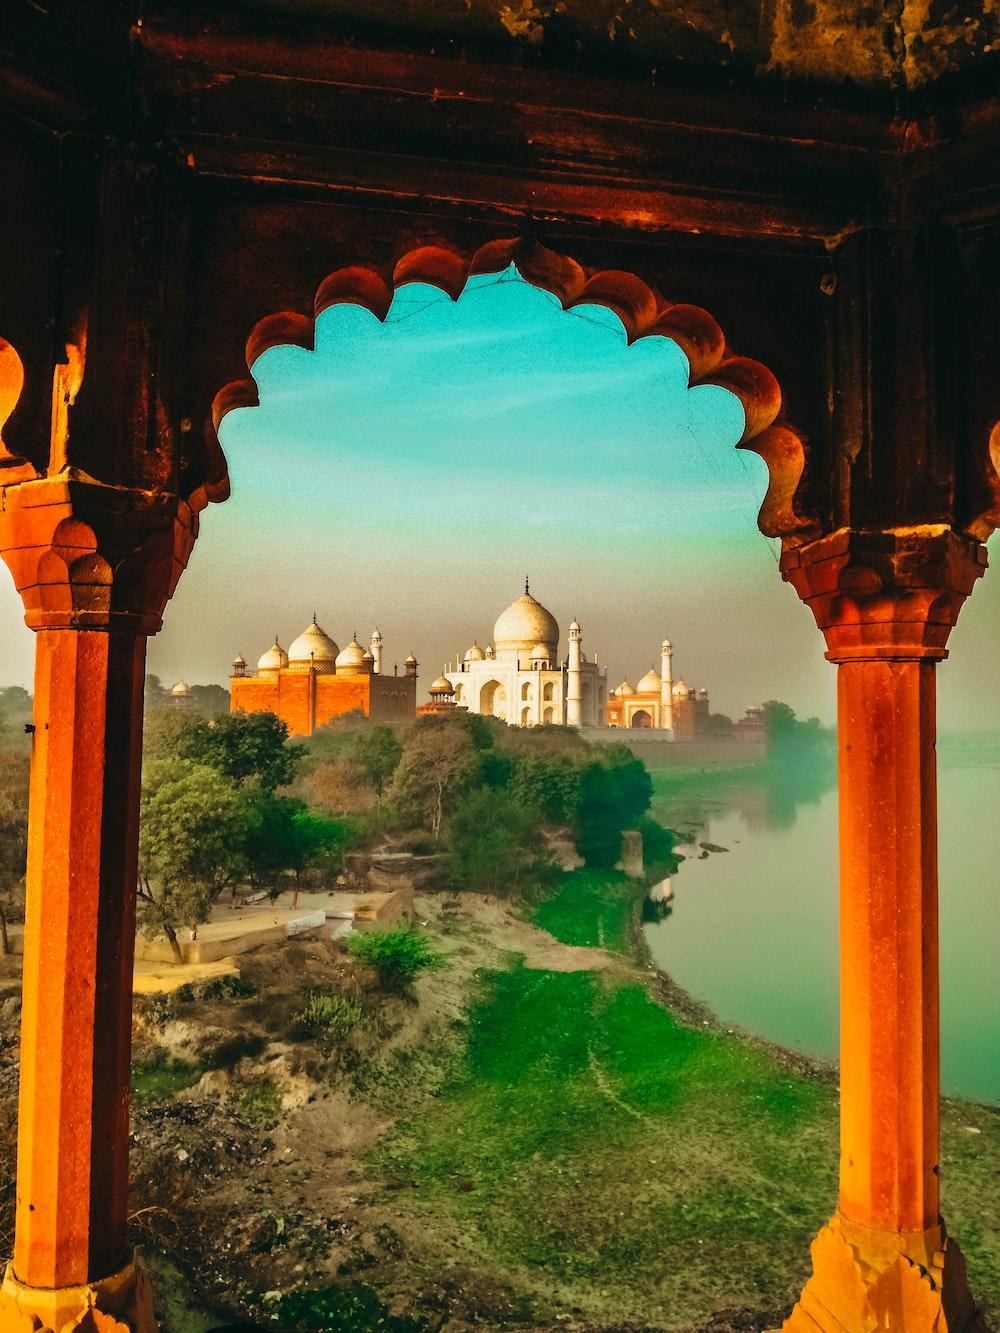 500 Stunning India Photos Download Free Images On Unsplash